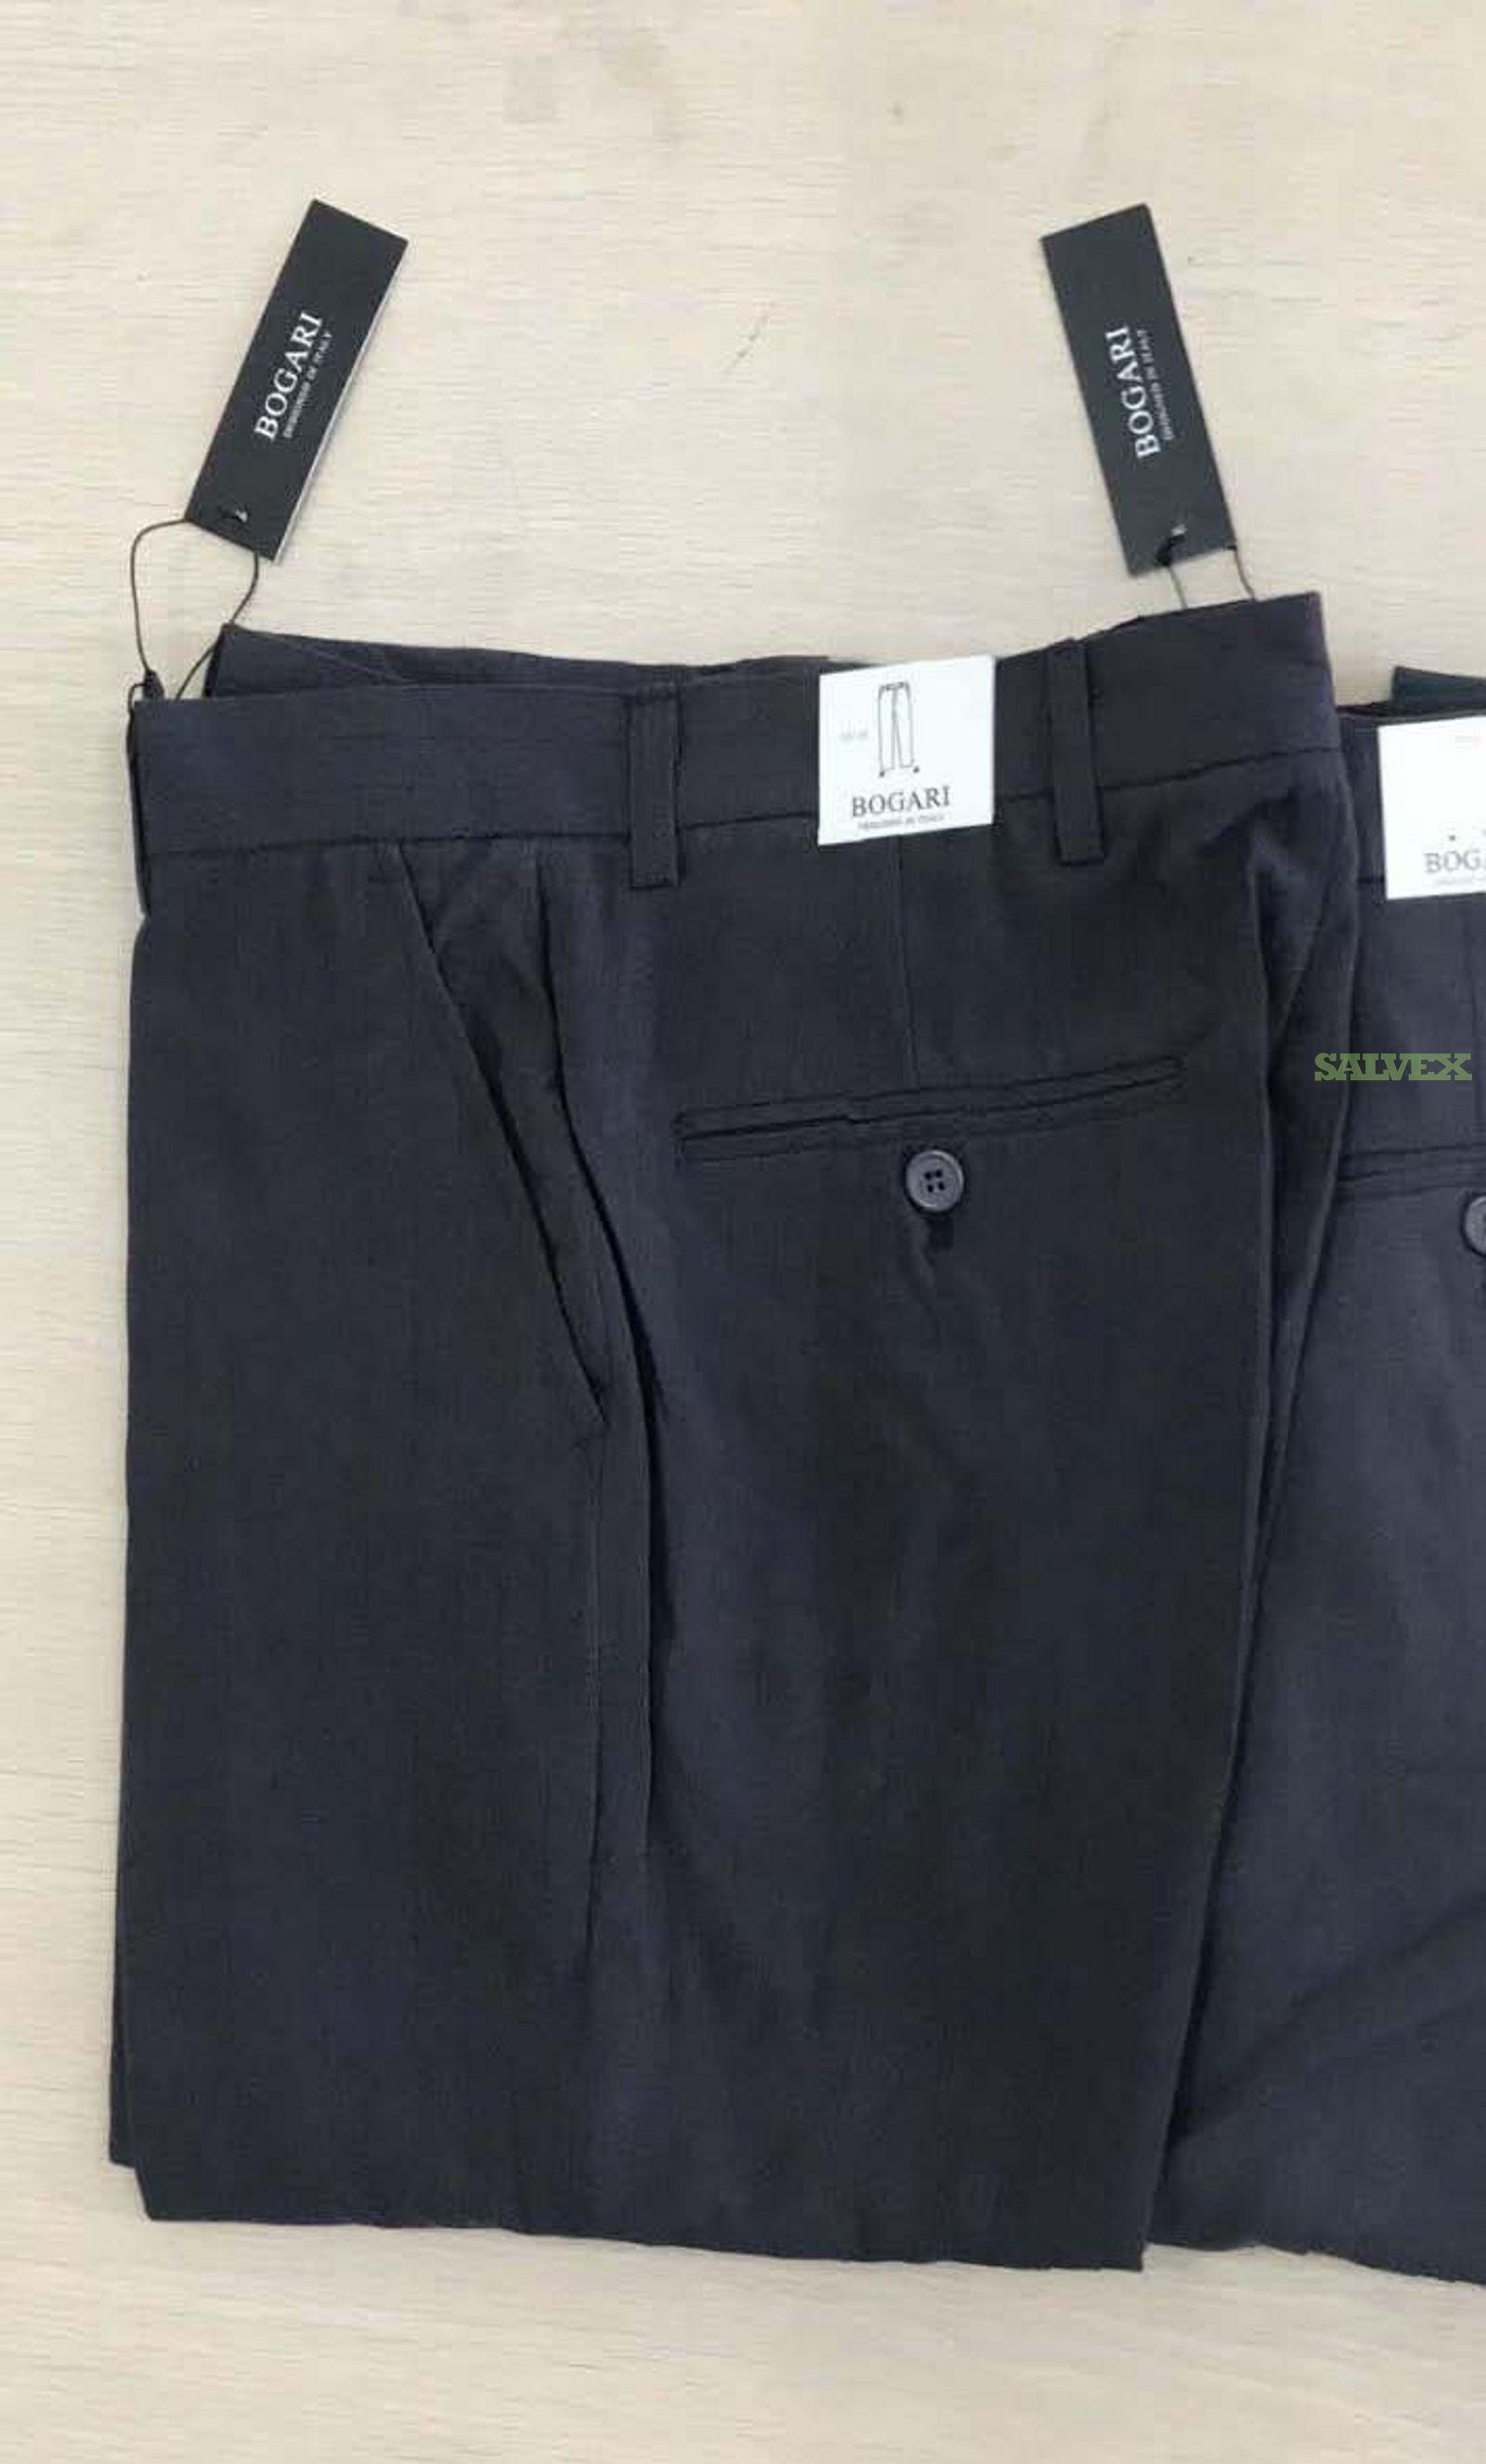 Bugari & Lashalie W. Men's Pants (113,664 pcs Total / Estimated 100 Pallets / 3 Container Loads) in California